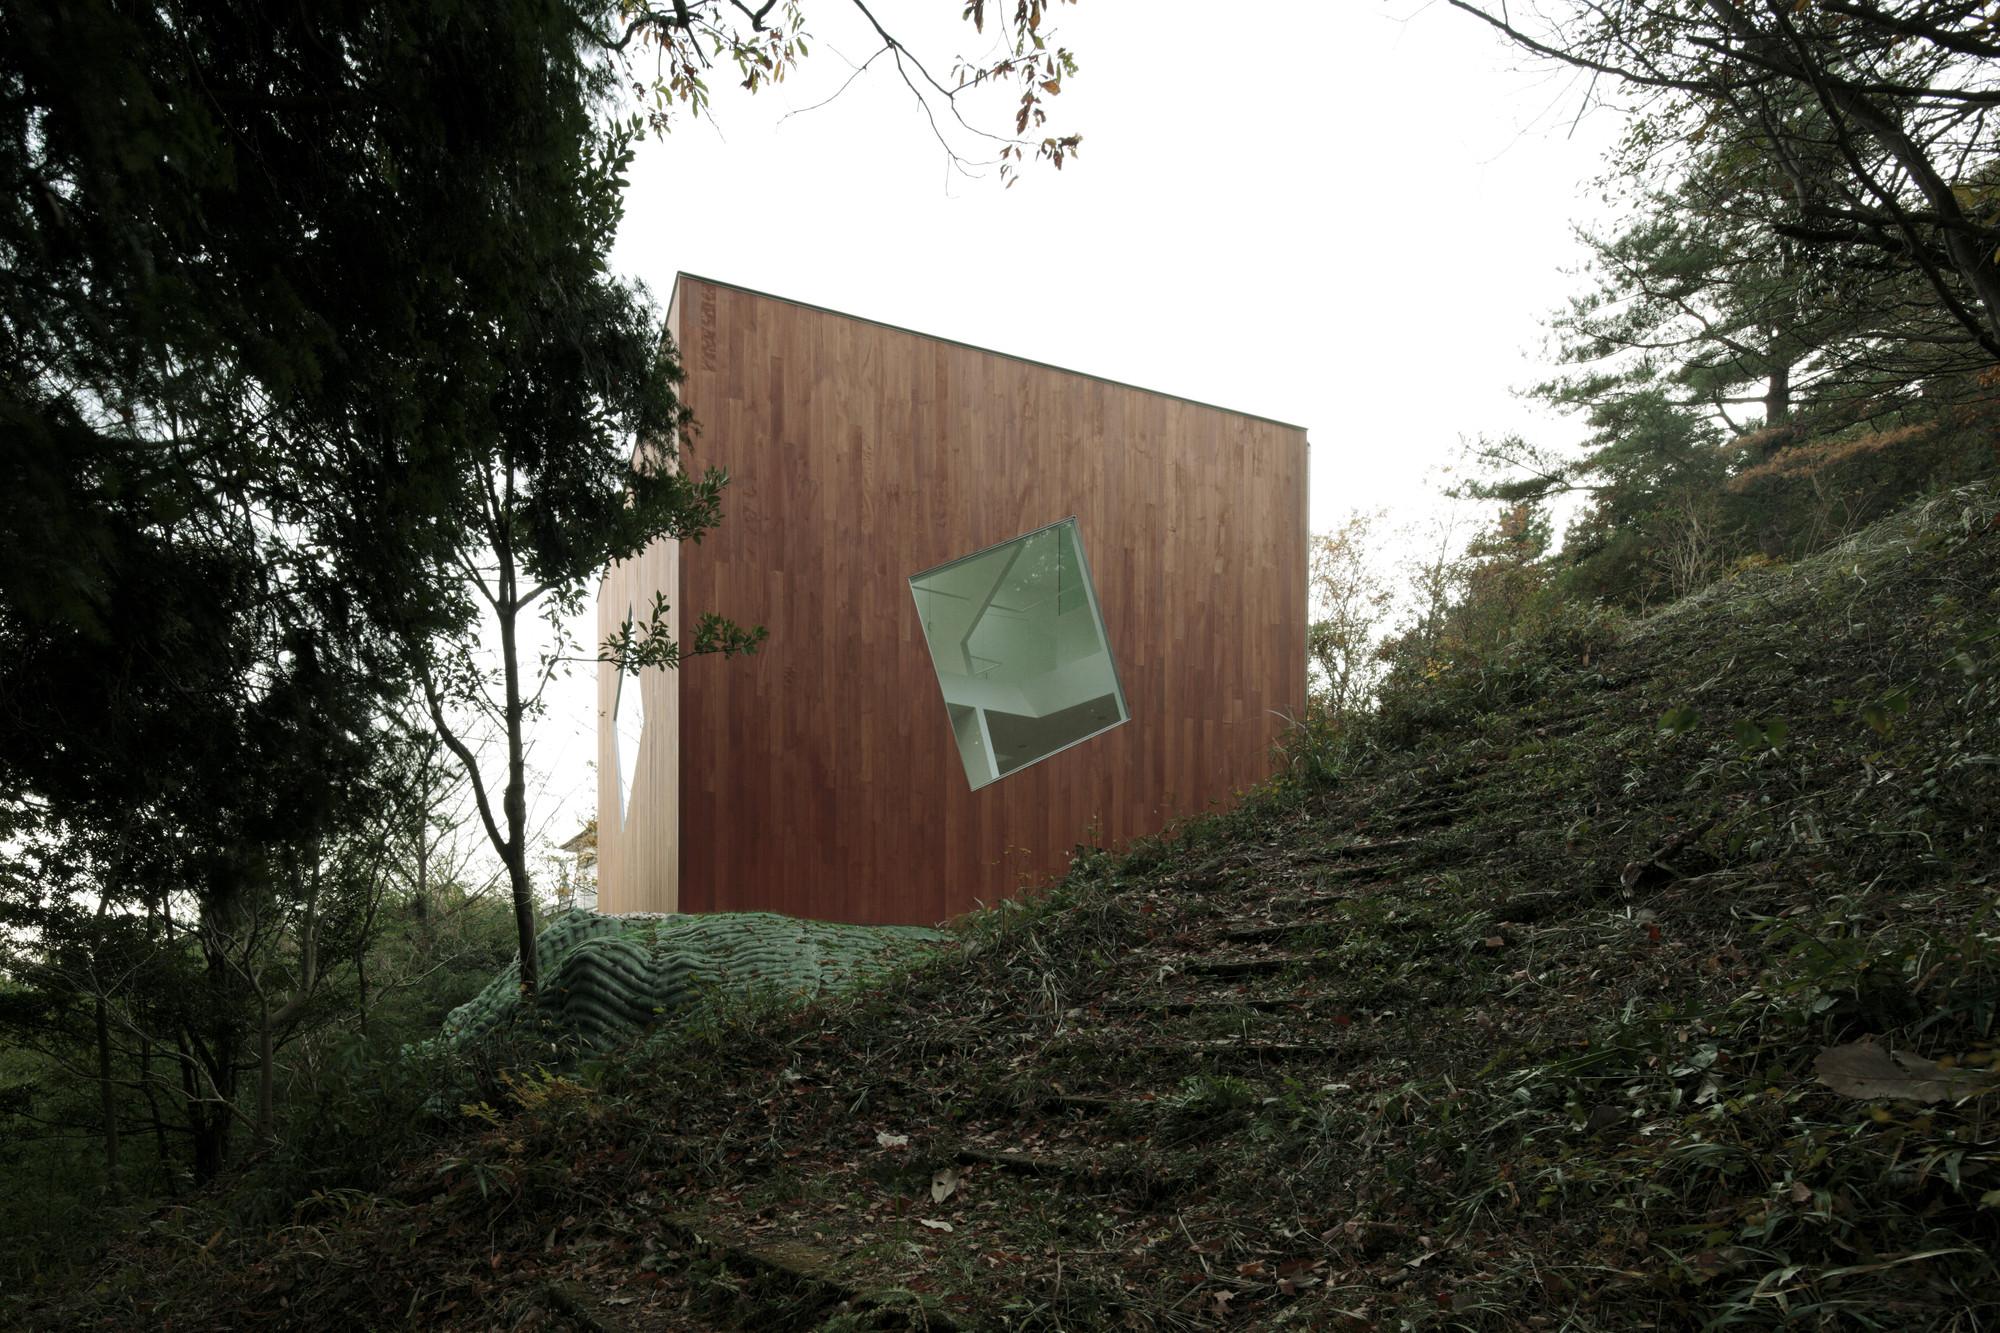 Villa Kanousan / Yuusuke Karasawa Architects, Courtesy of Yuusuke Karasawa Architects